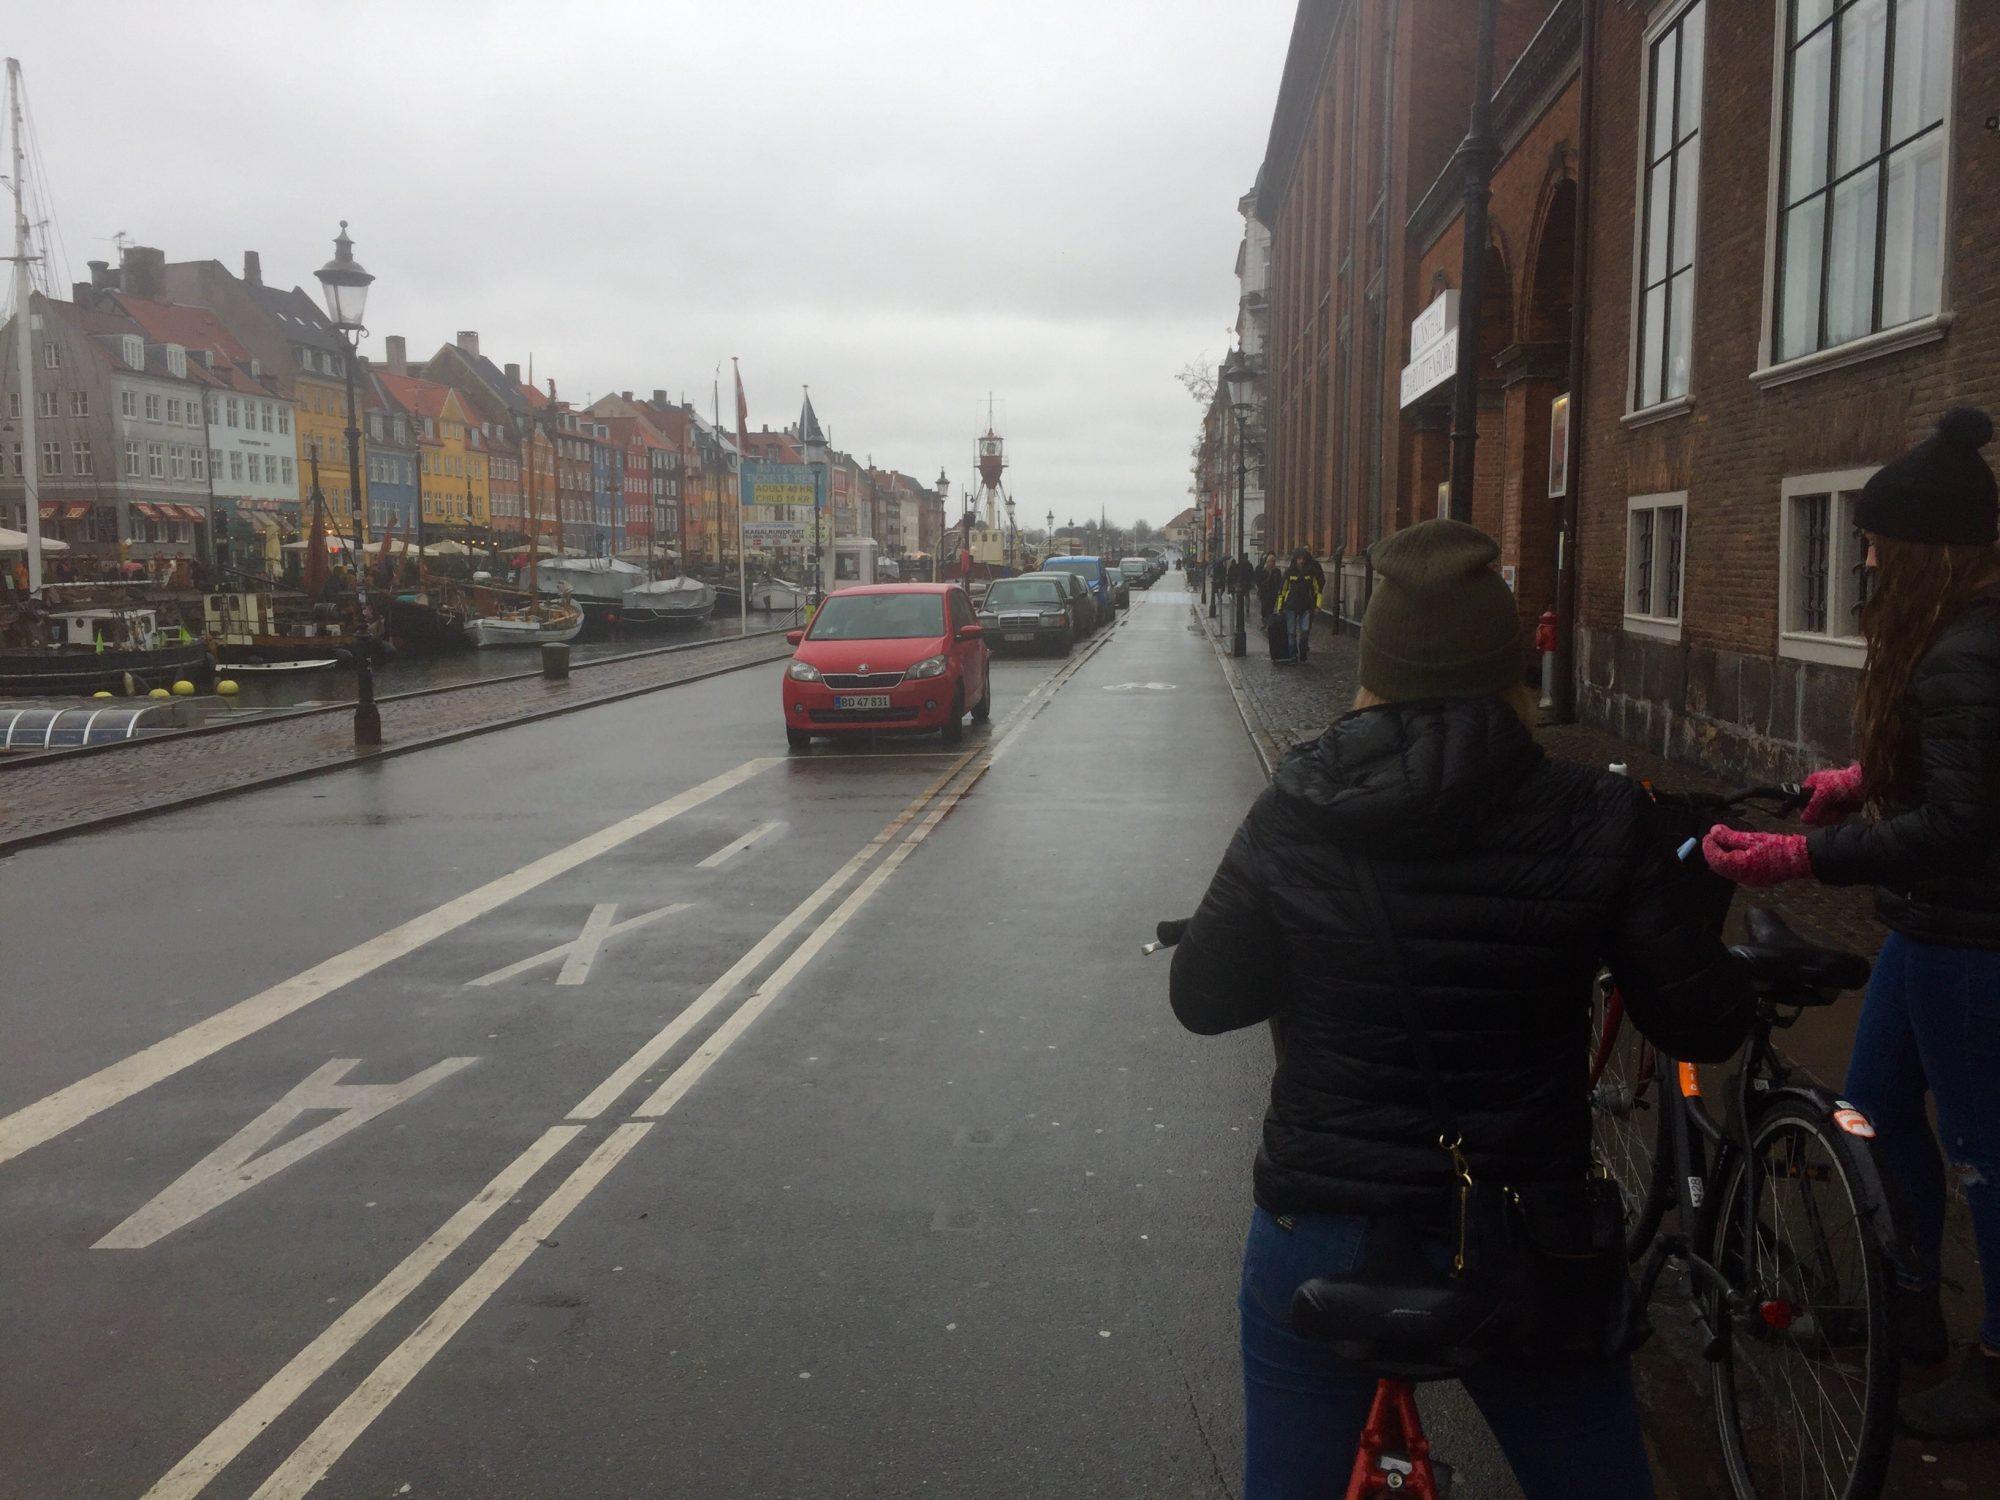 Nyhavn, Copenhagen. We chose the coldest and rainiest day to bike around Copenhagen, but nevertheless I think biking is the best way to see Copenhagen!